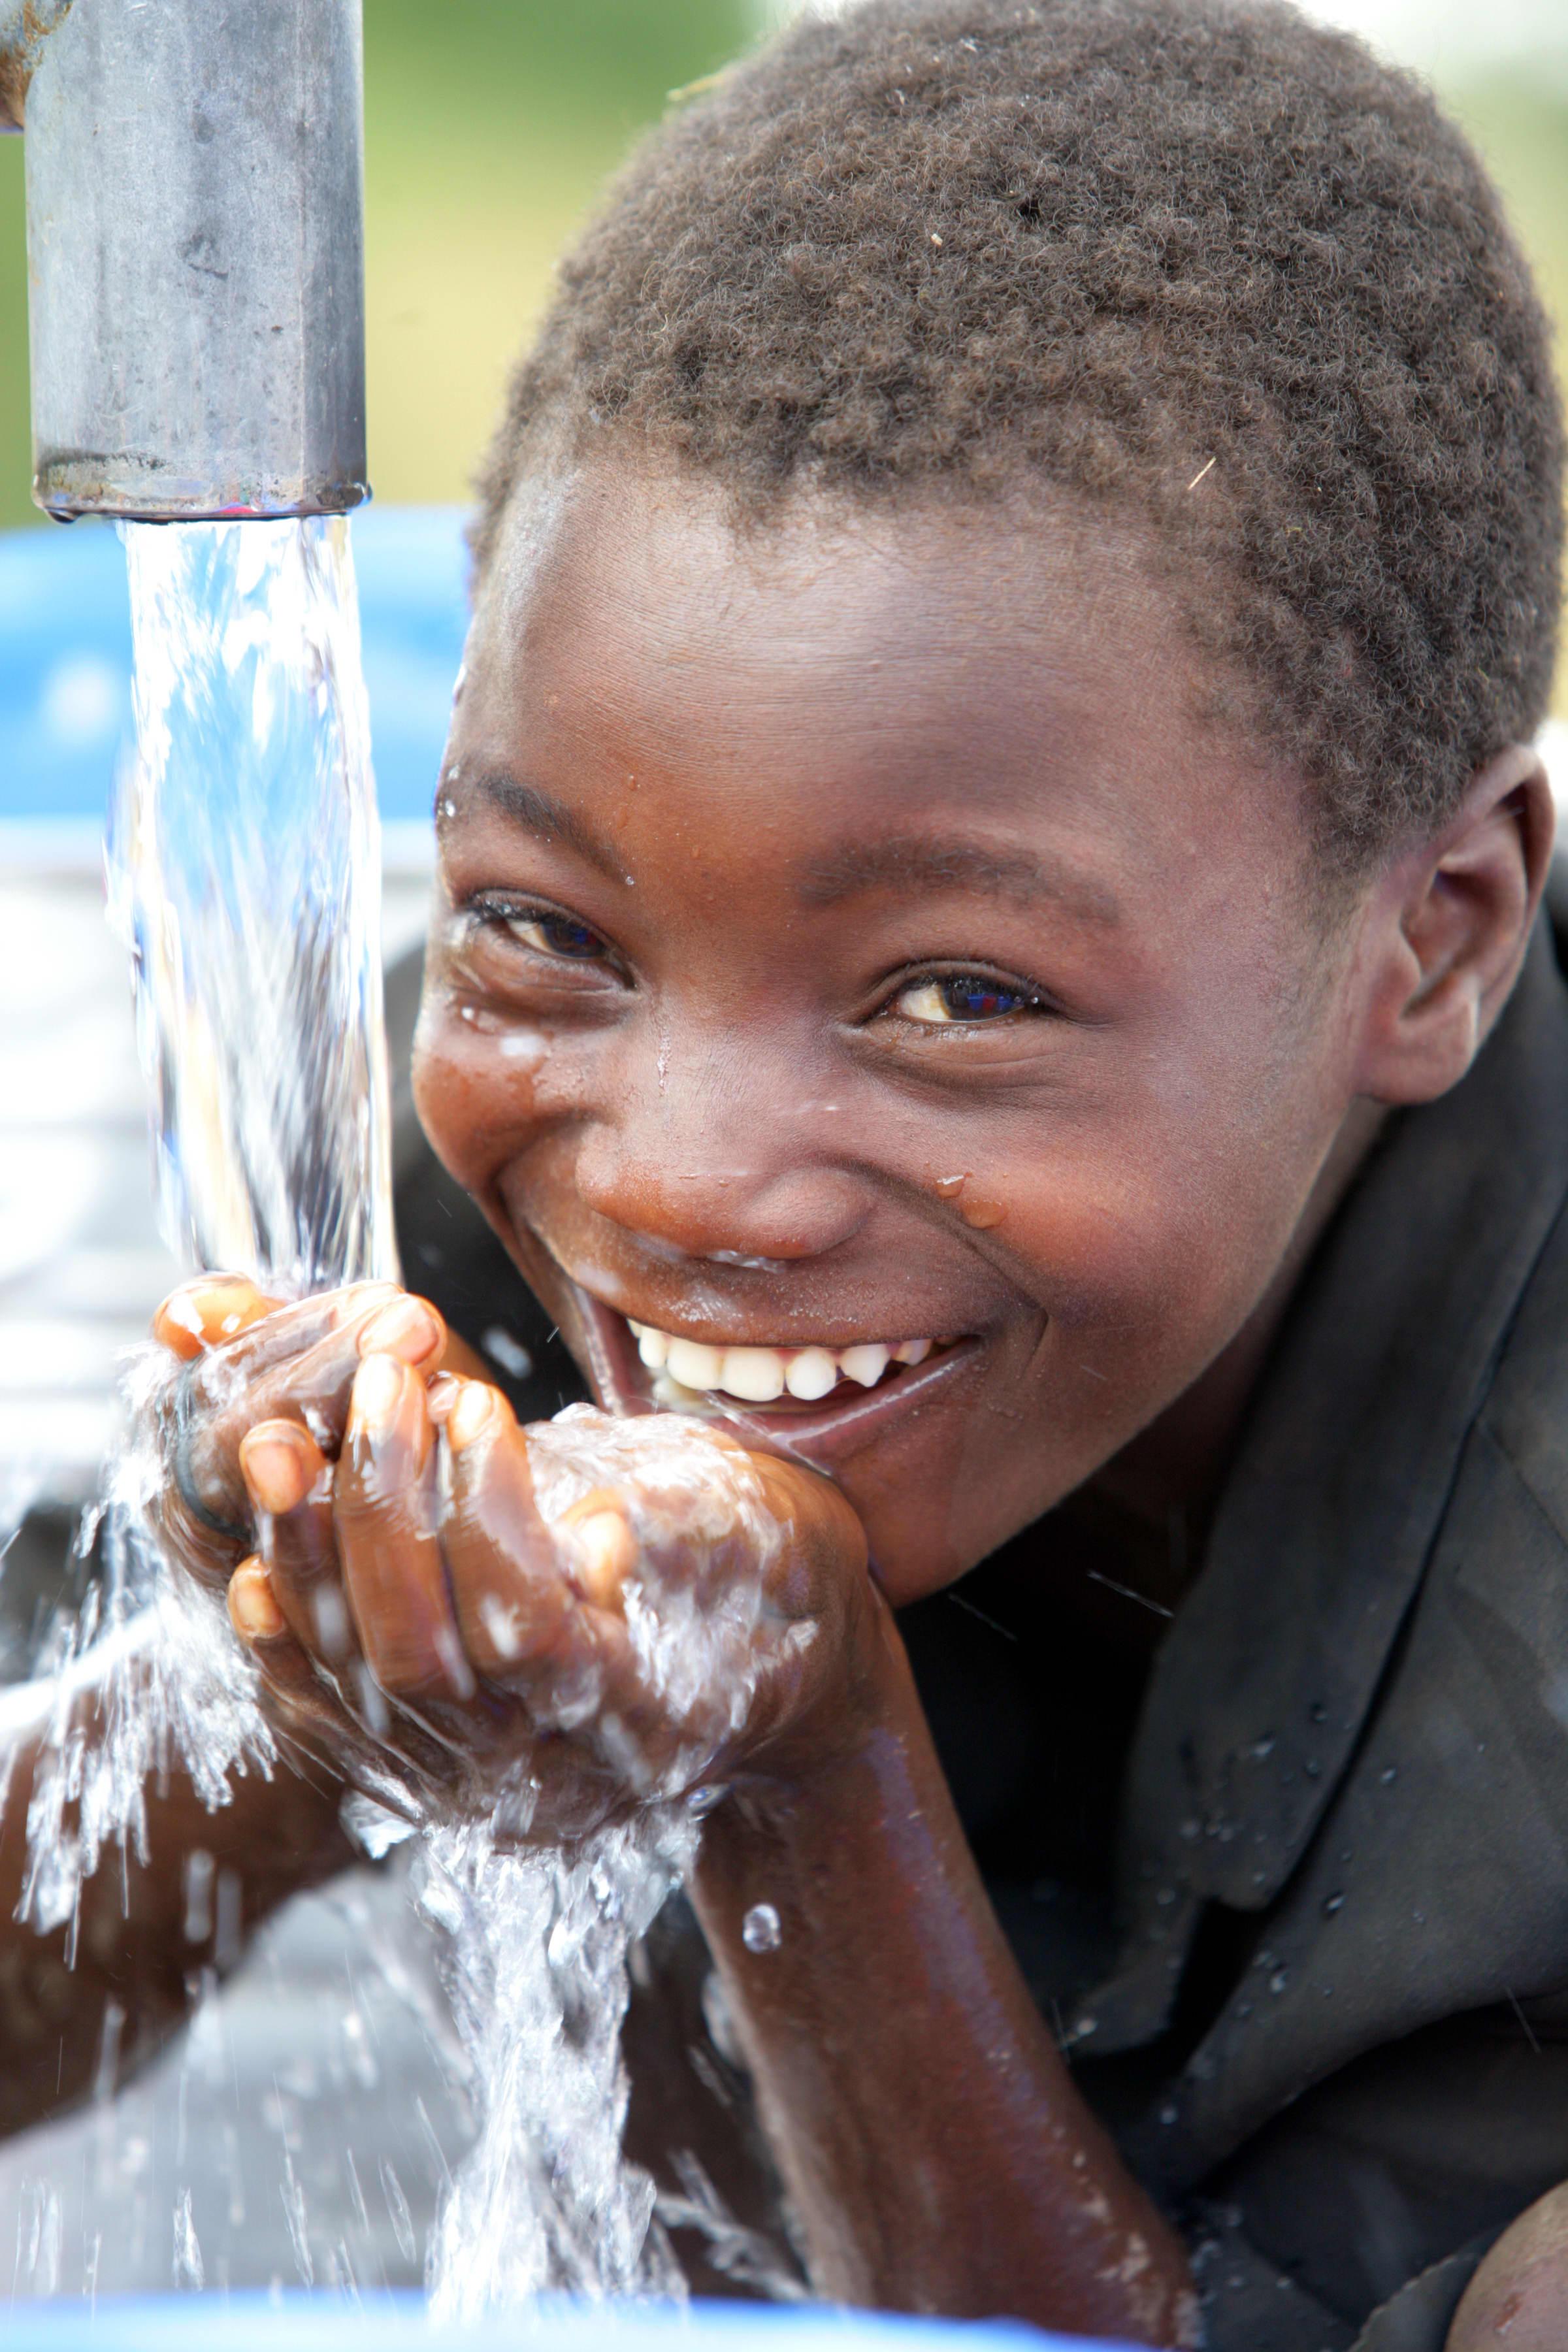 50 kroner kan rense 6000 liter vann. Foto: UNICEF/Pirozzi